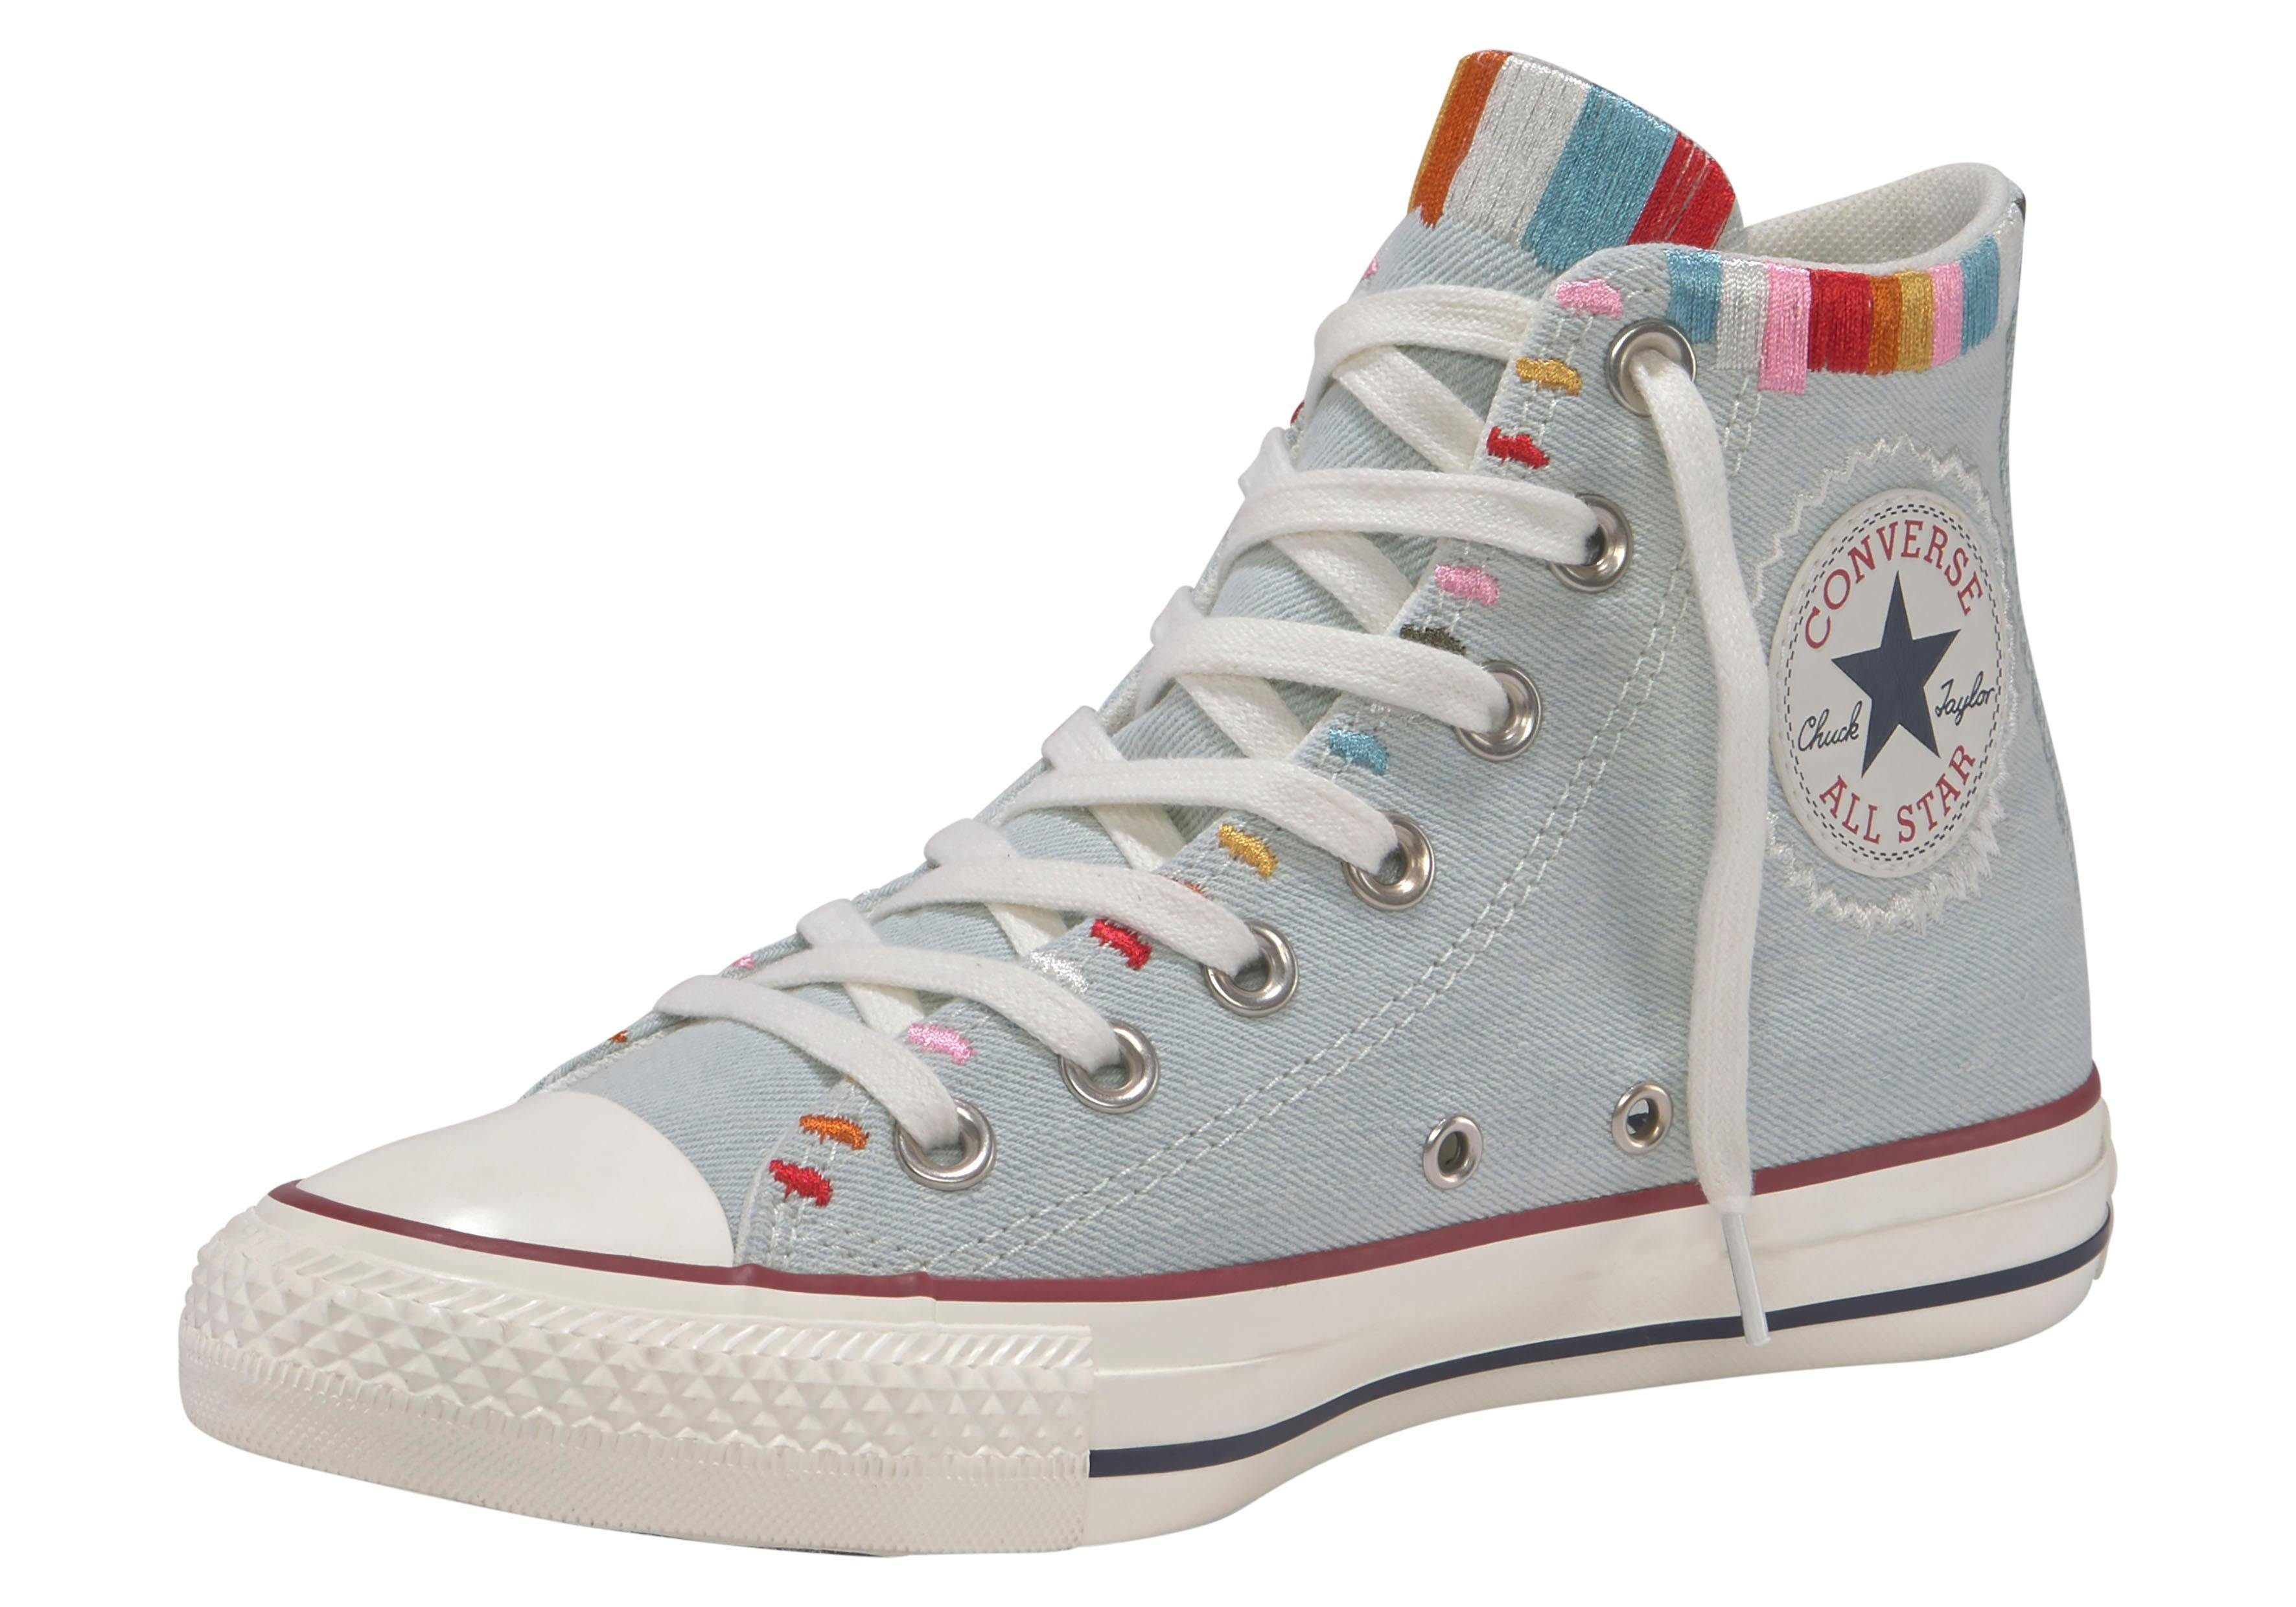 Converse »Chuck Taylor All Star Hi Festival« Sneaker online kaufen | OTTO